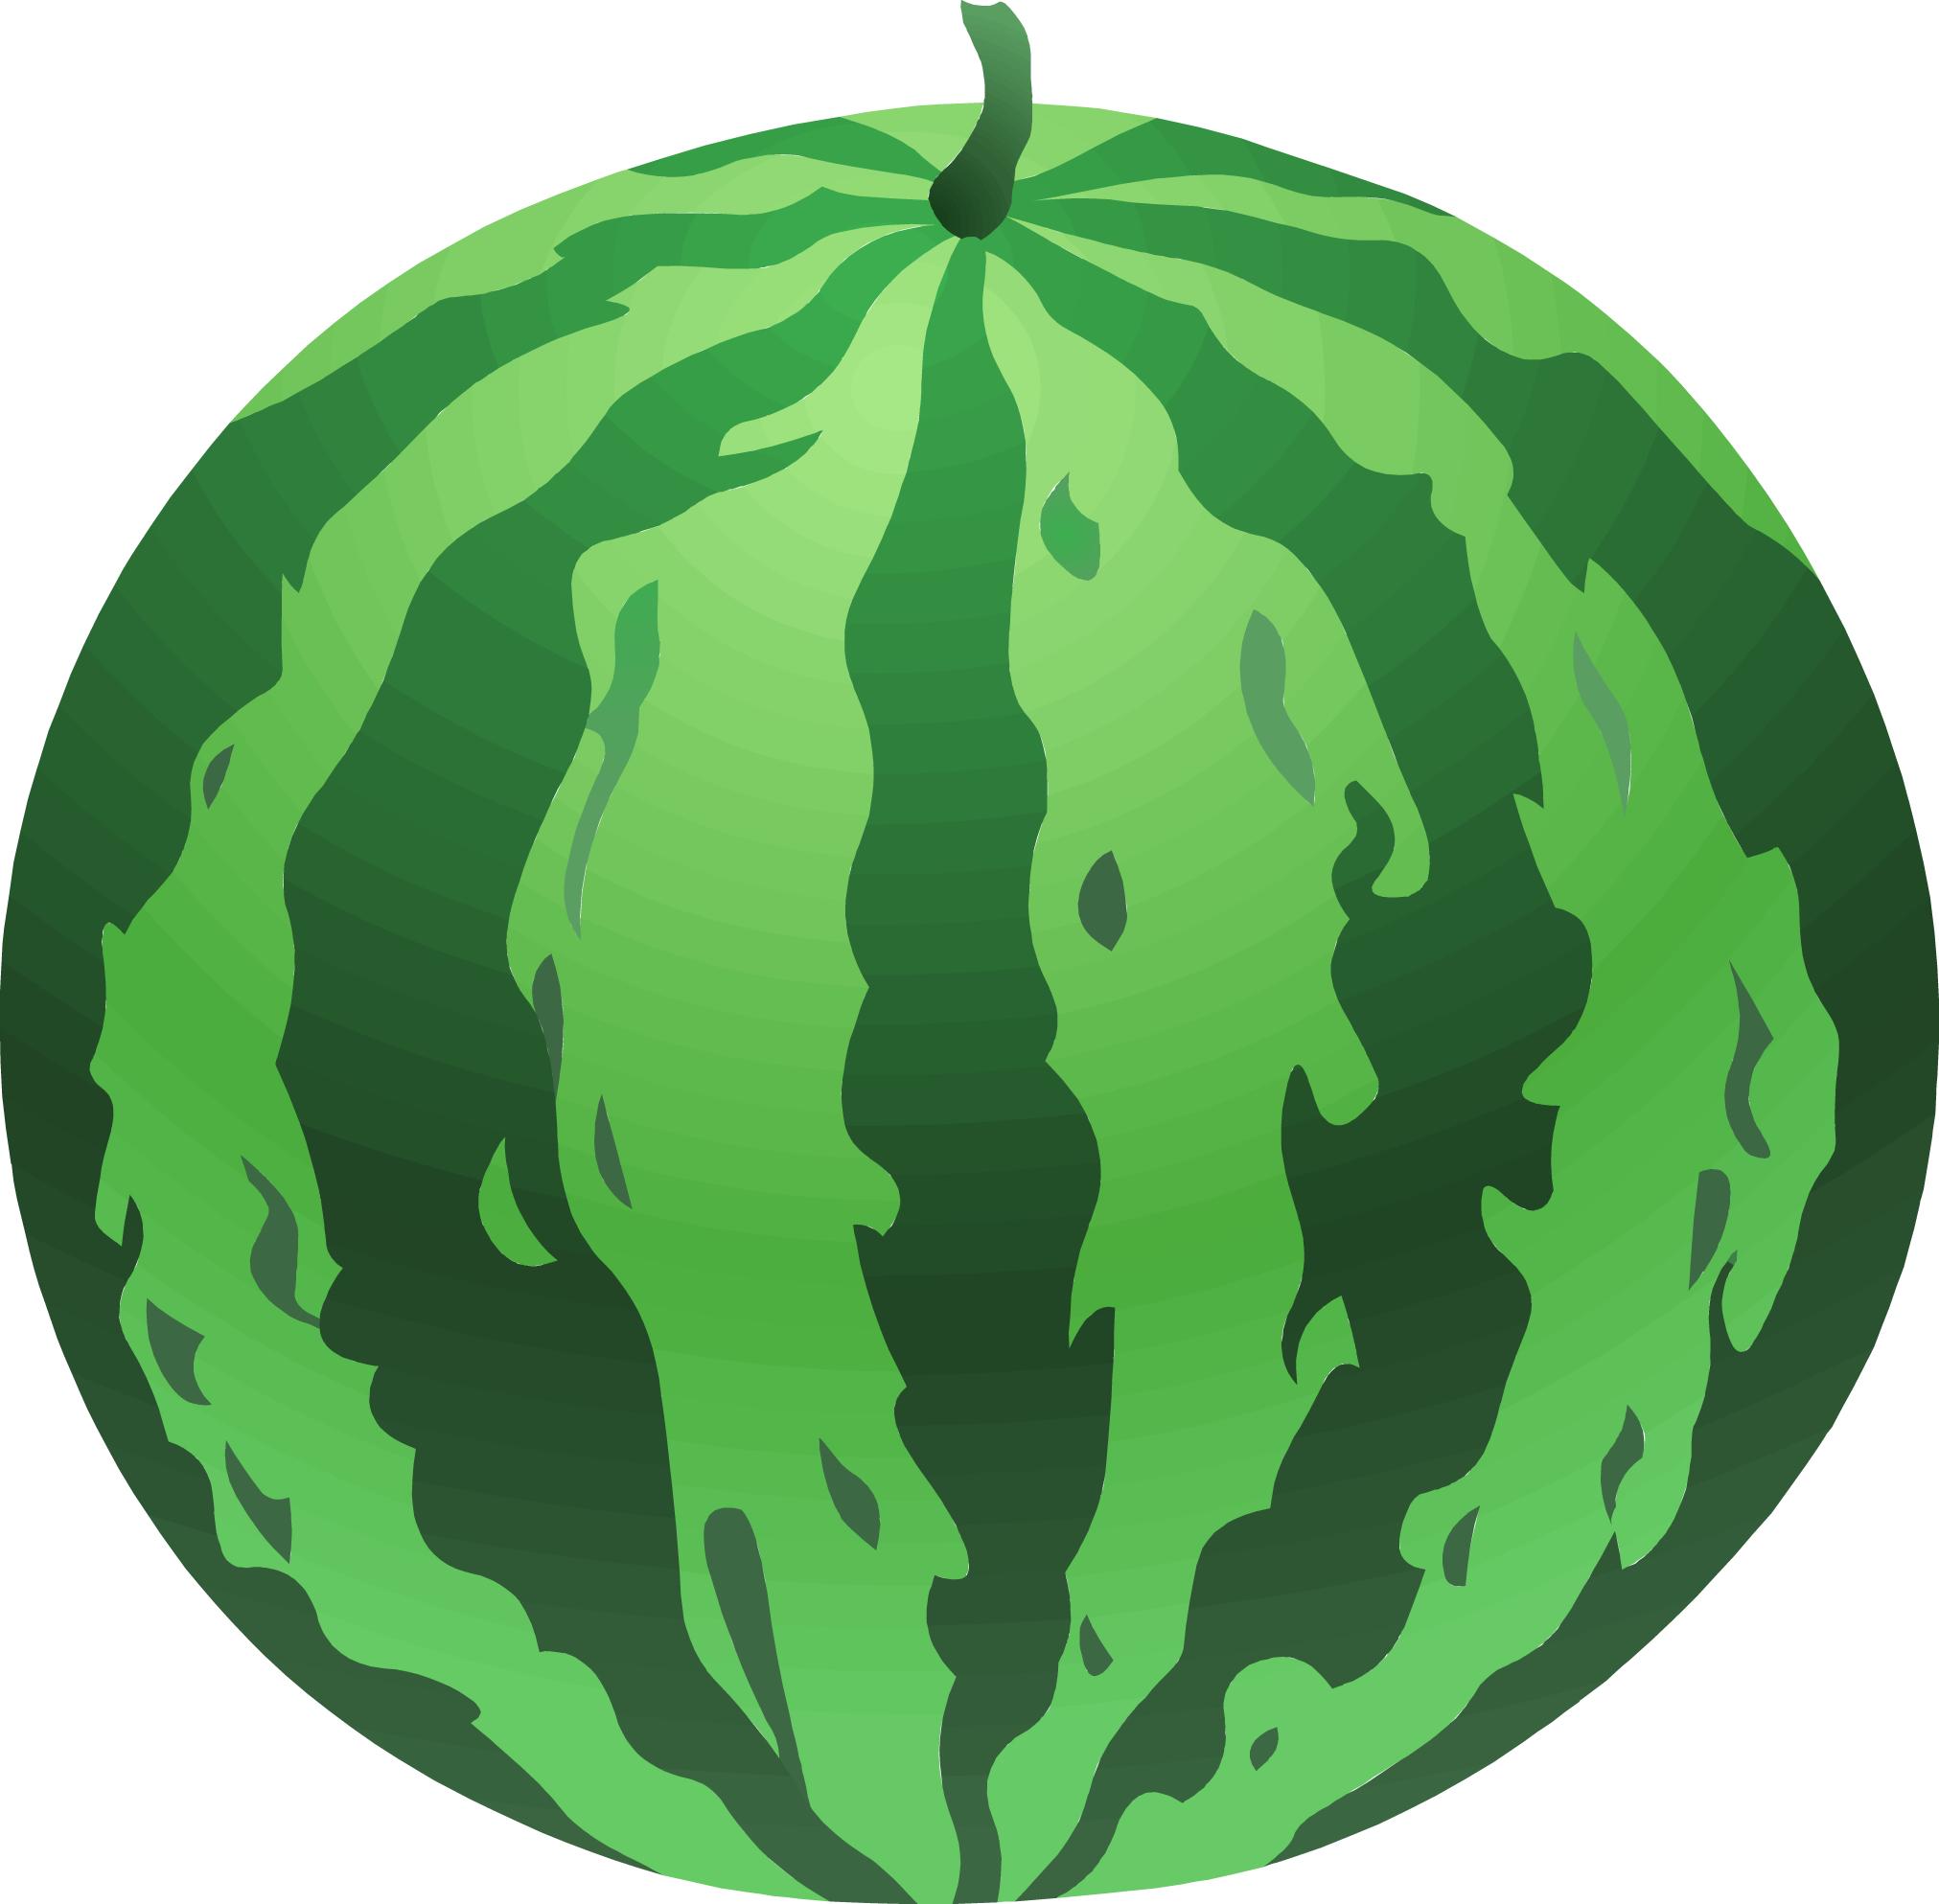 Watermelon clipart free clip art image 1.